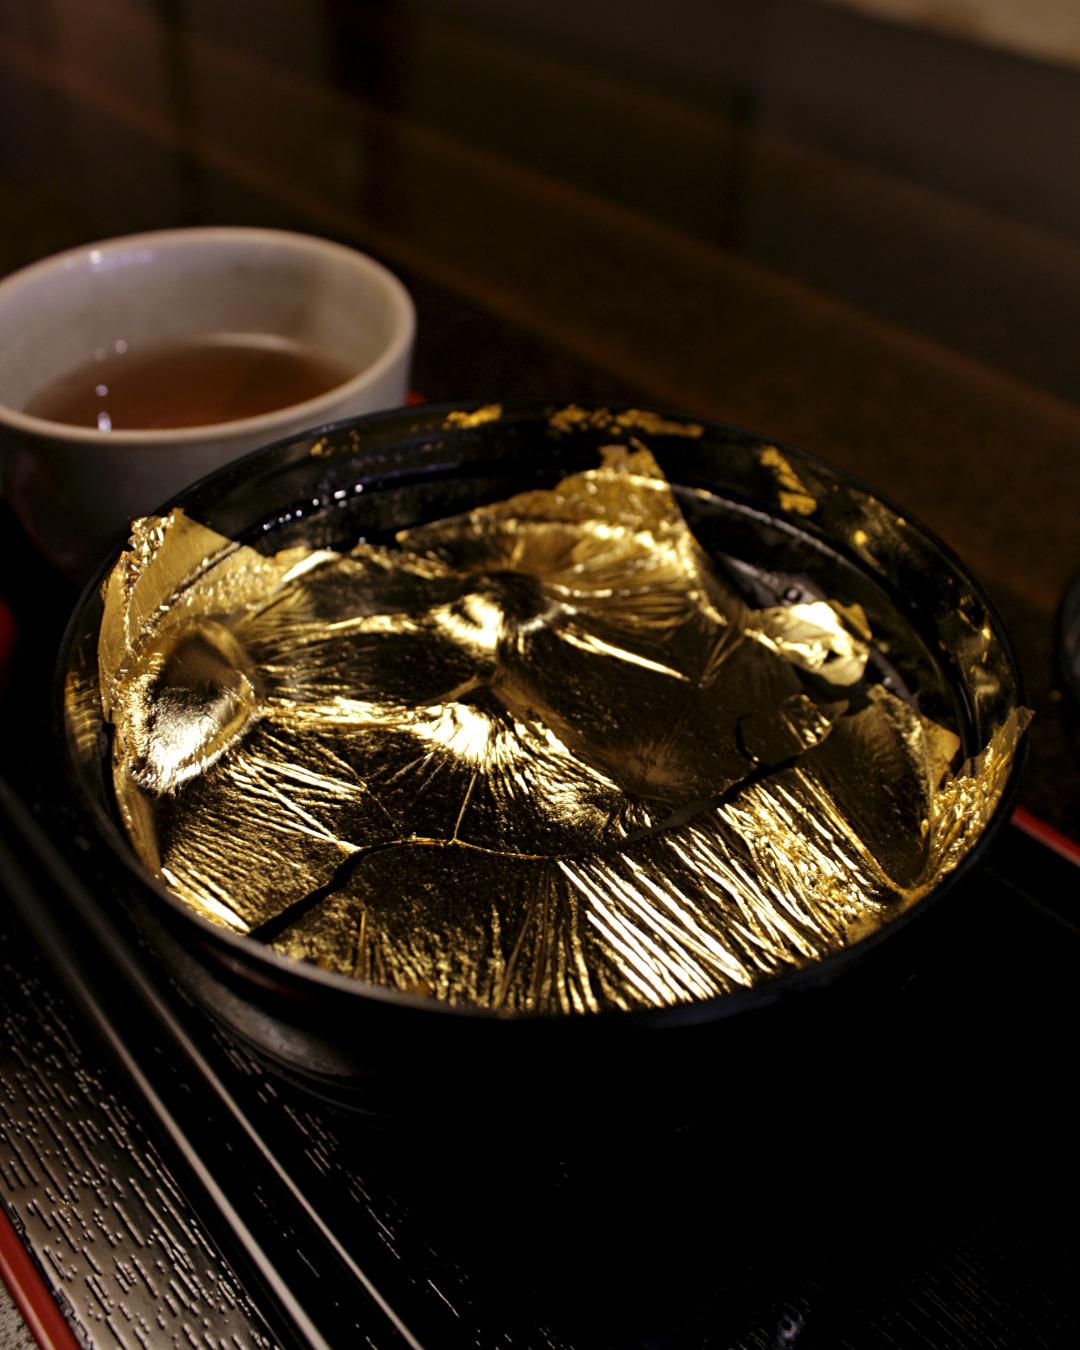 Gold Leaf atop Sweet Bean Soup at Kaikaro Tea House in Higashi Chaya Geisha District, Kanazawa, Japan